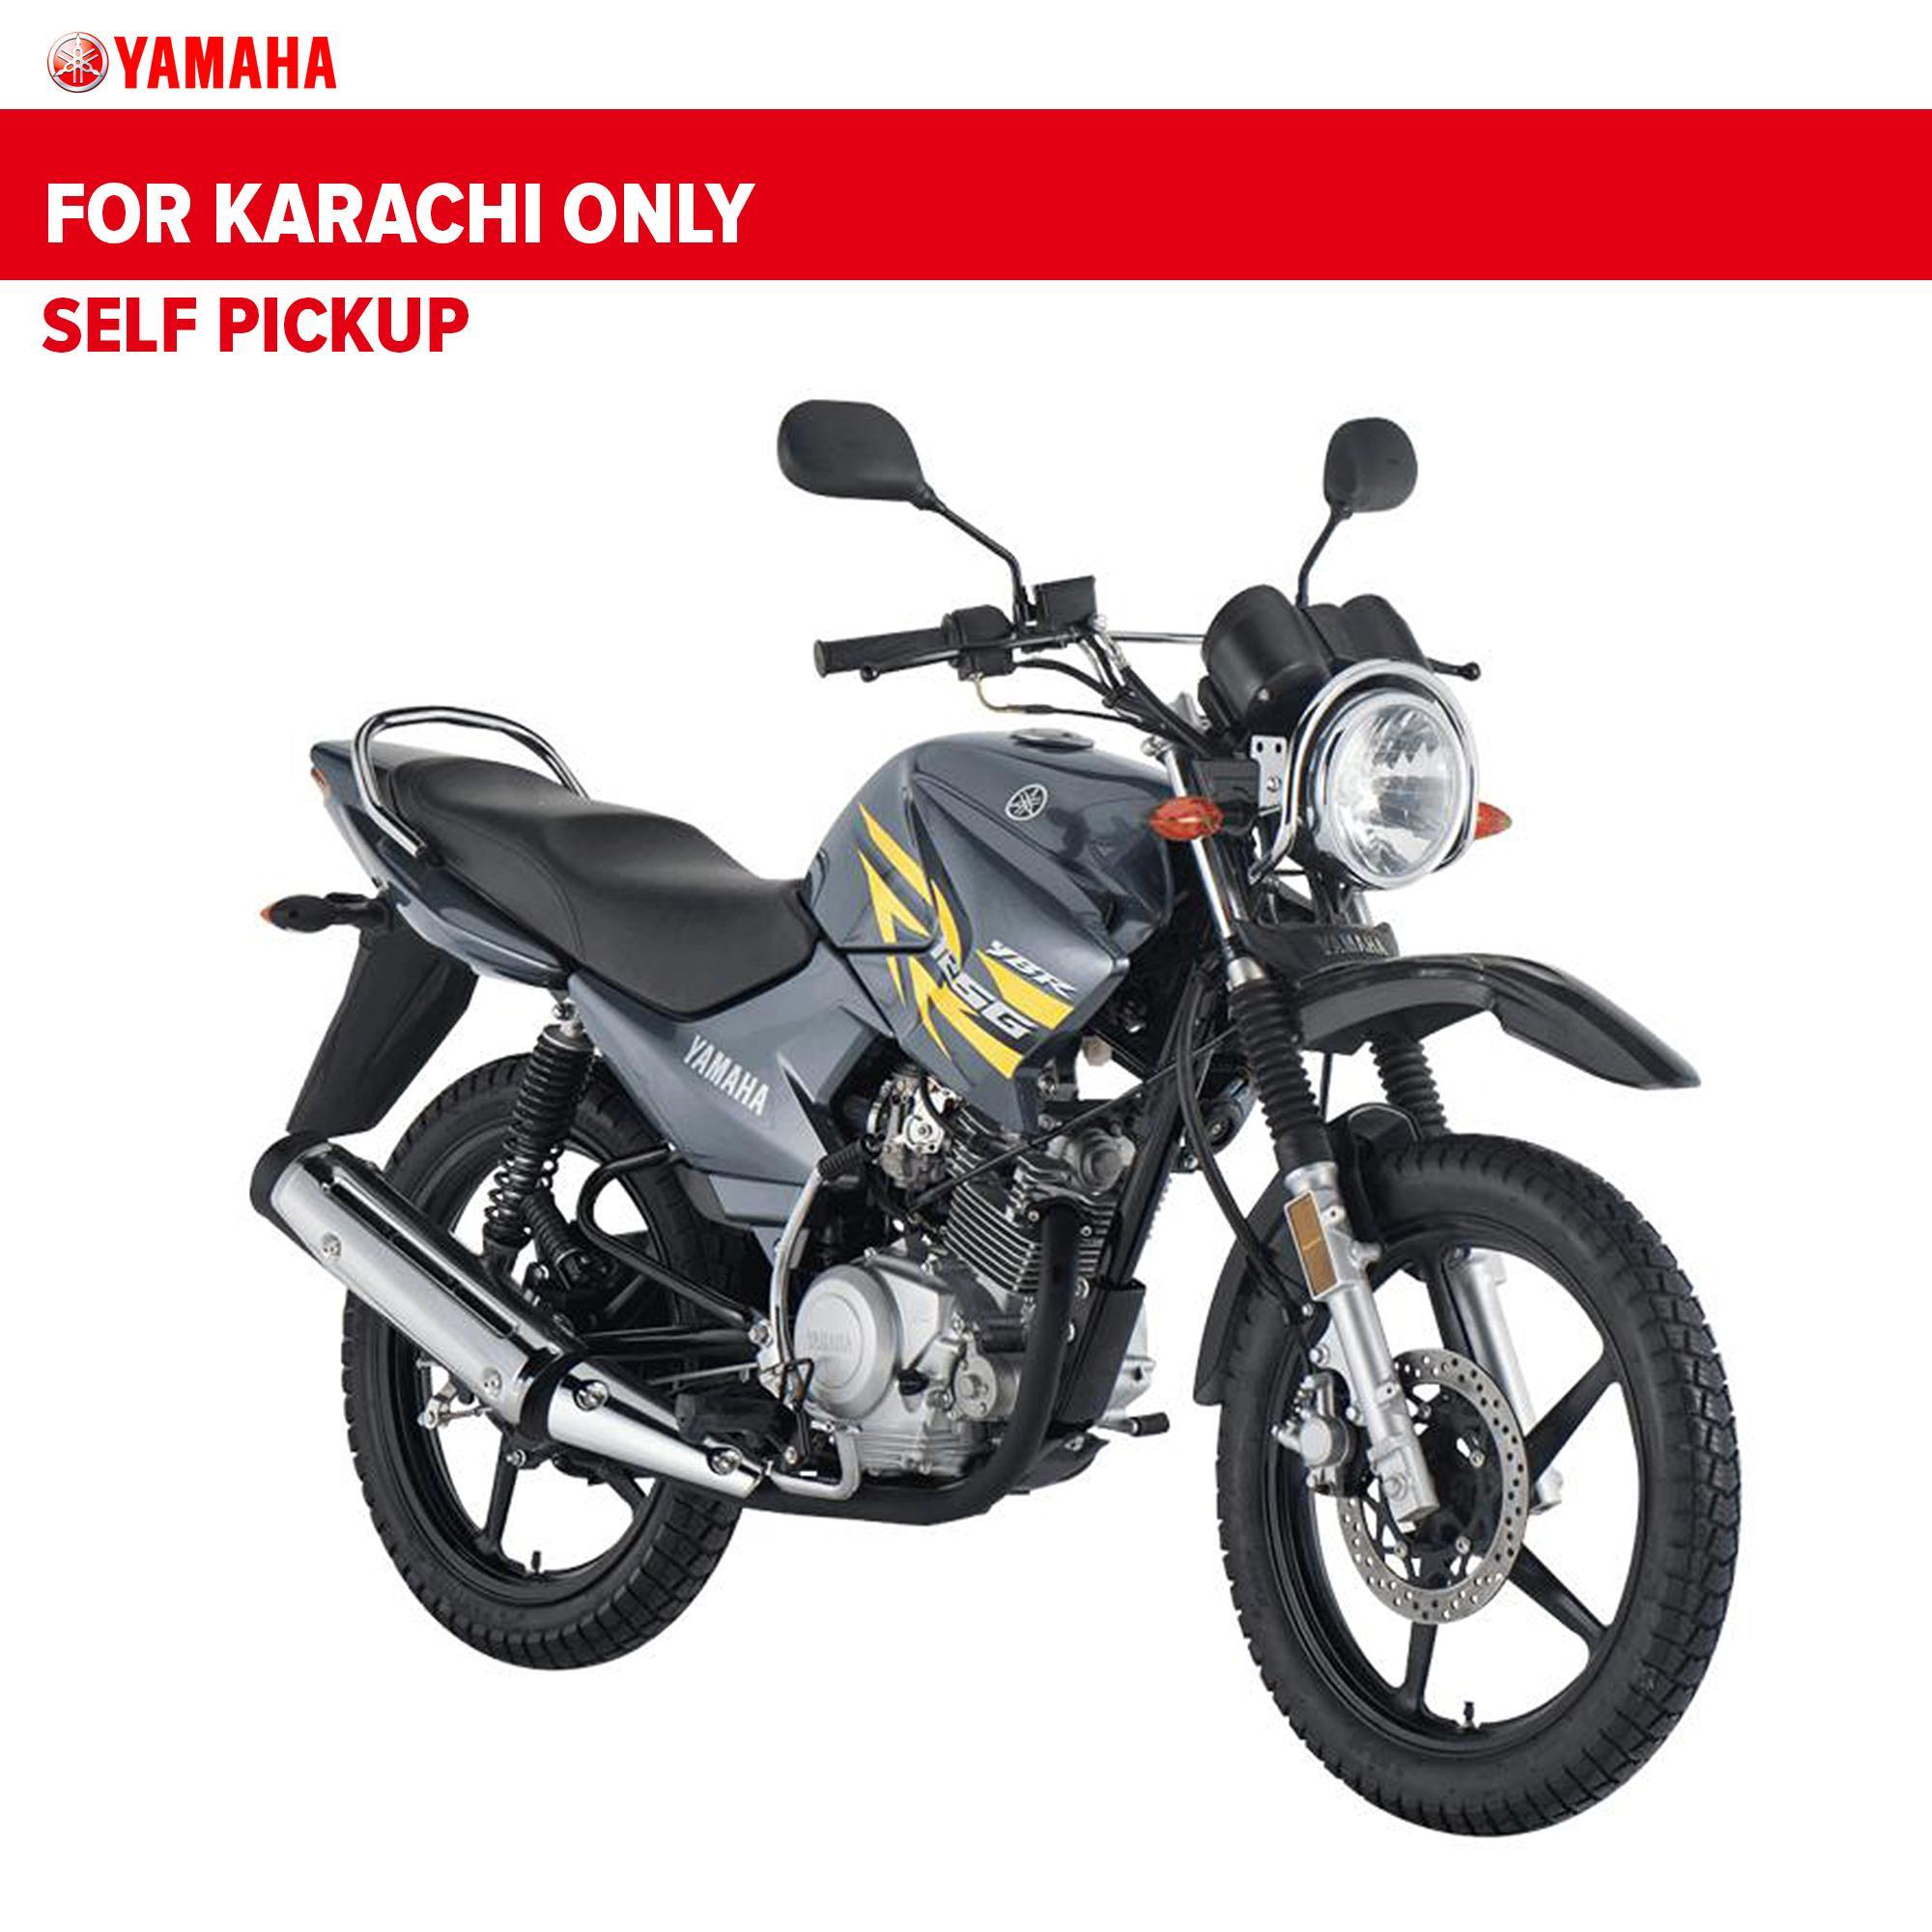 Yamaha Ybr 125 G Night Fluo Grey 2019 Only For Karachi